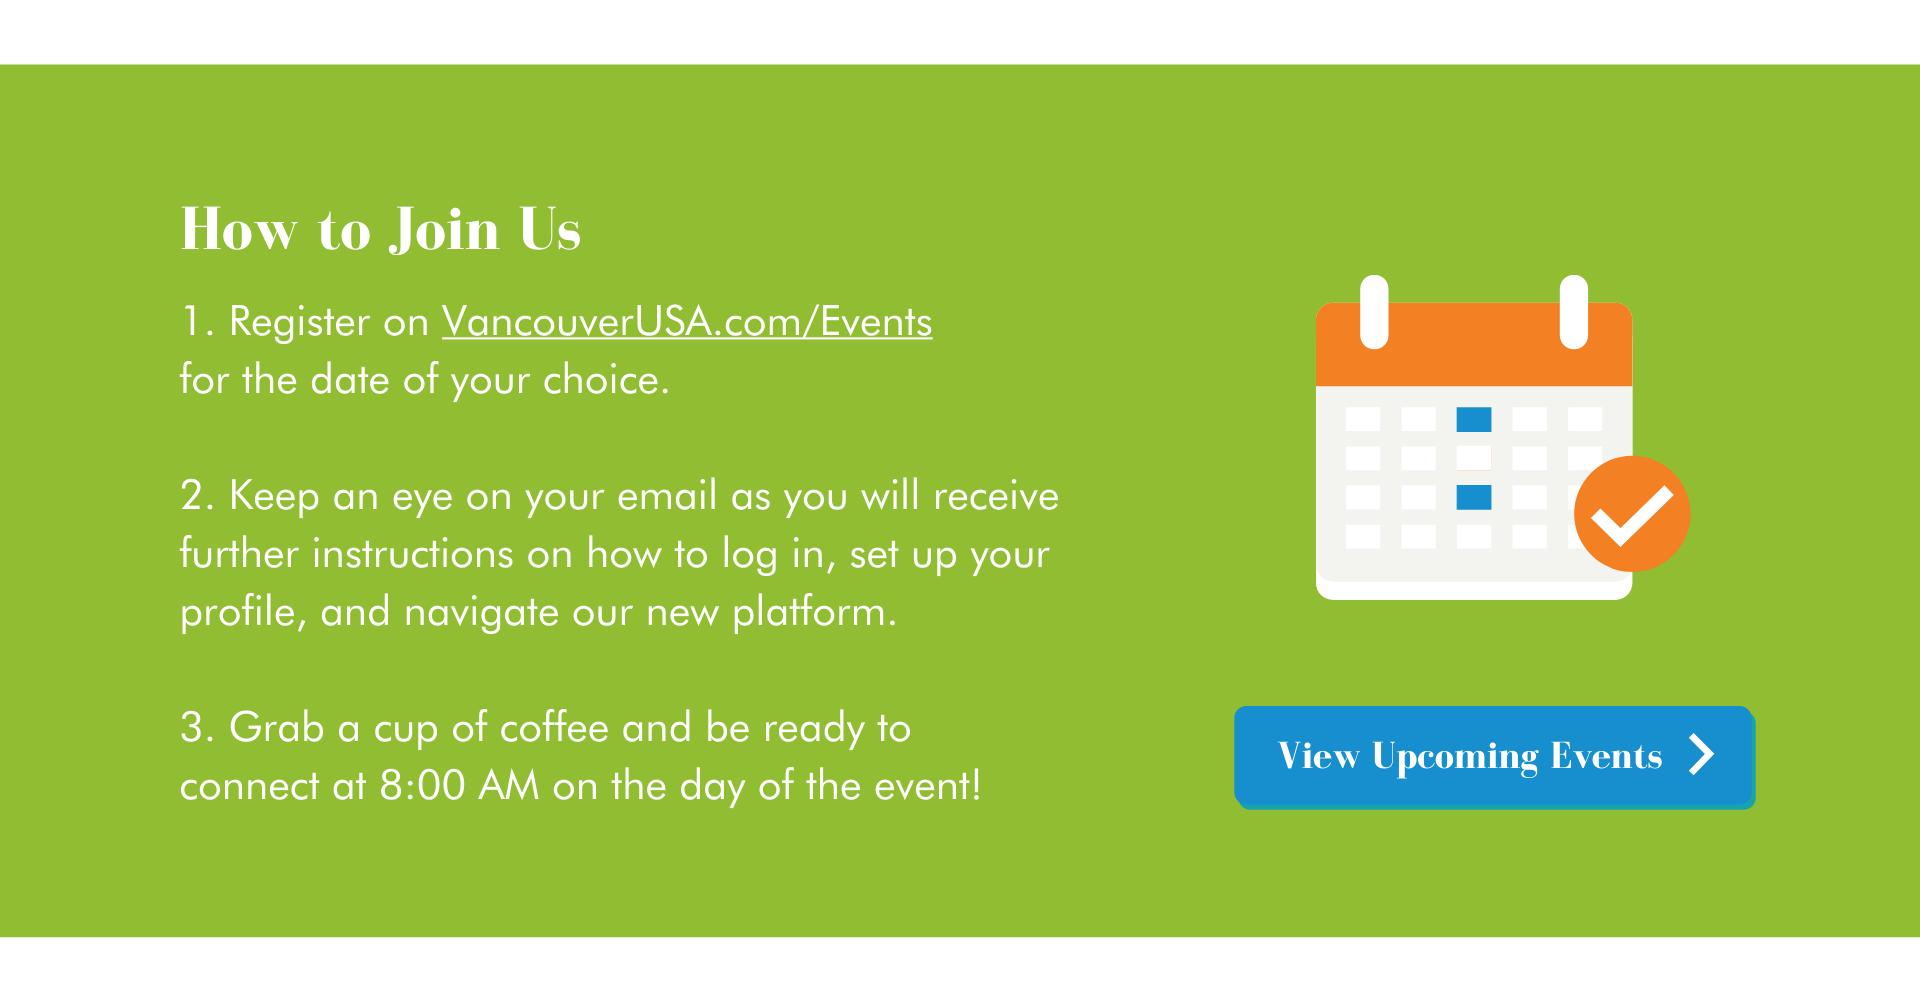 how to join us vancouverusa.com/events calendar link cta